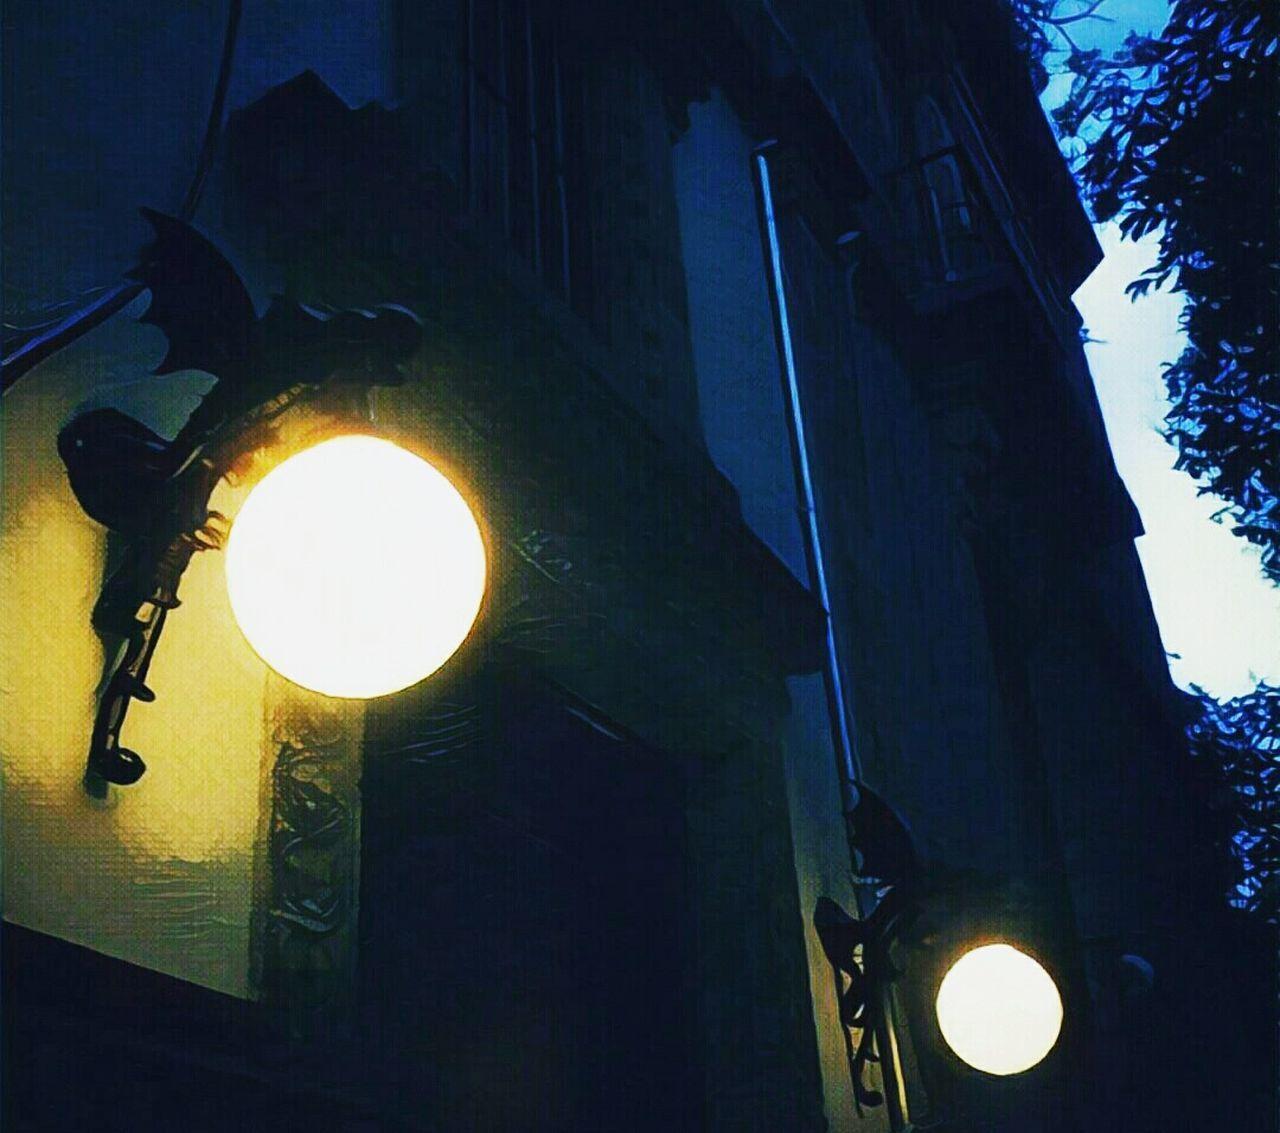 Los dragones de la Roma Low Angle View Architecture Illuminated Urban Scene Sculpture Mexicocity  Blackandwhite Photography EyeEm Best Shots Eye4photography  Cdmx Mexicocity  Mexicodf Walk City Life Urban Geometry Urban